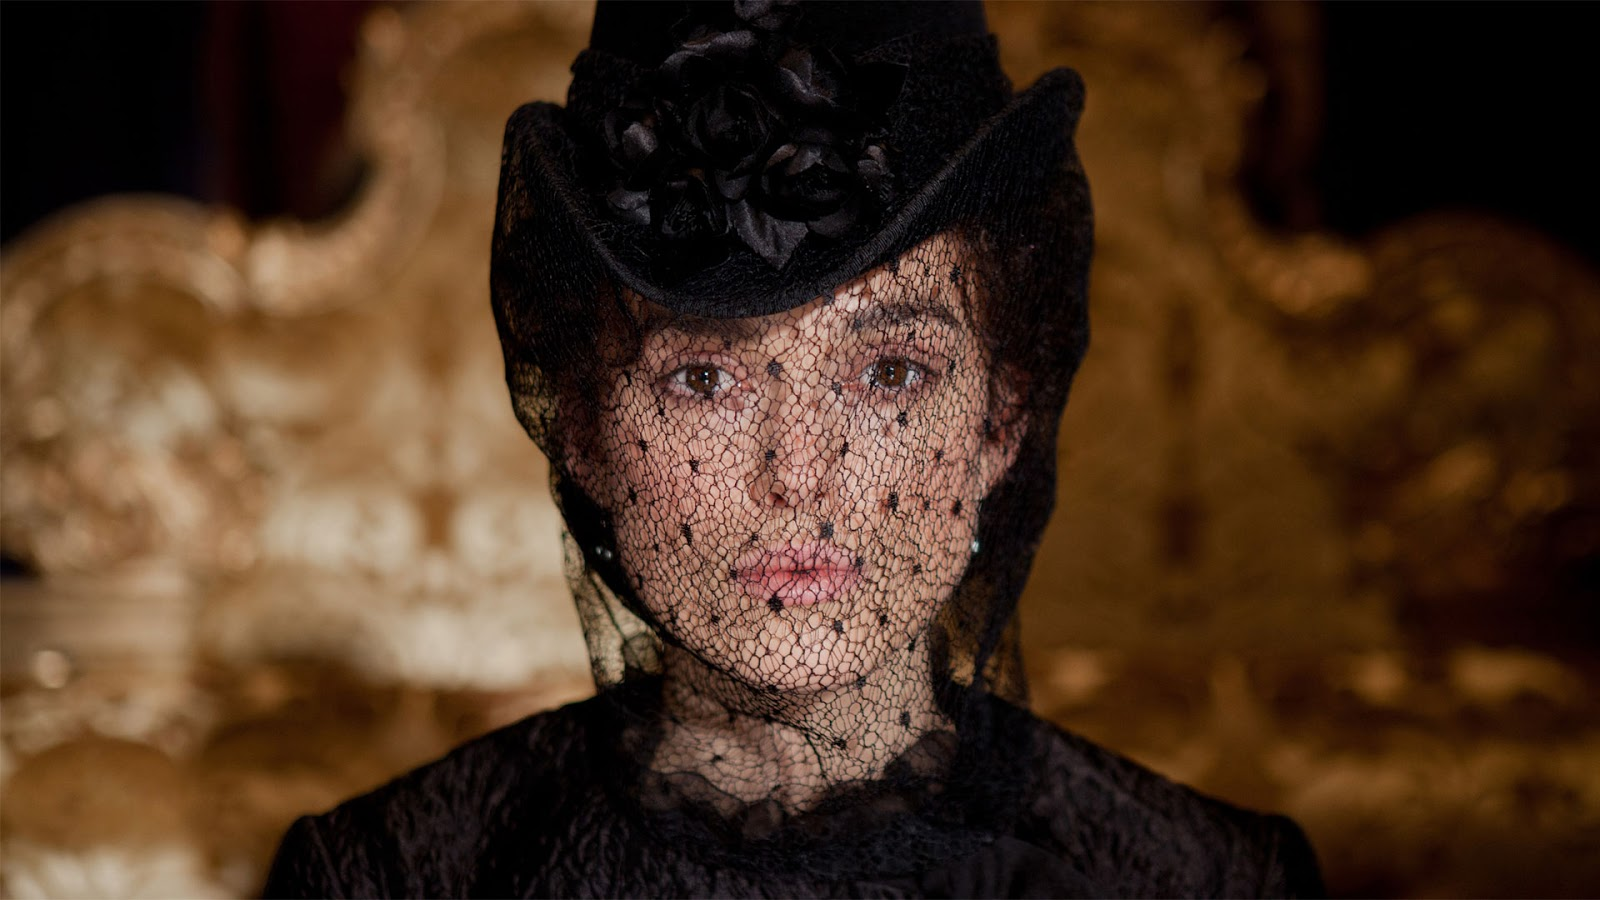 Anna Karenina Wallpapers Movie Hq Anna Karenina Pictures 4k Wallpapers 2019